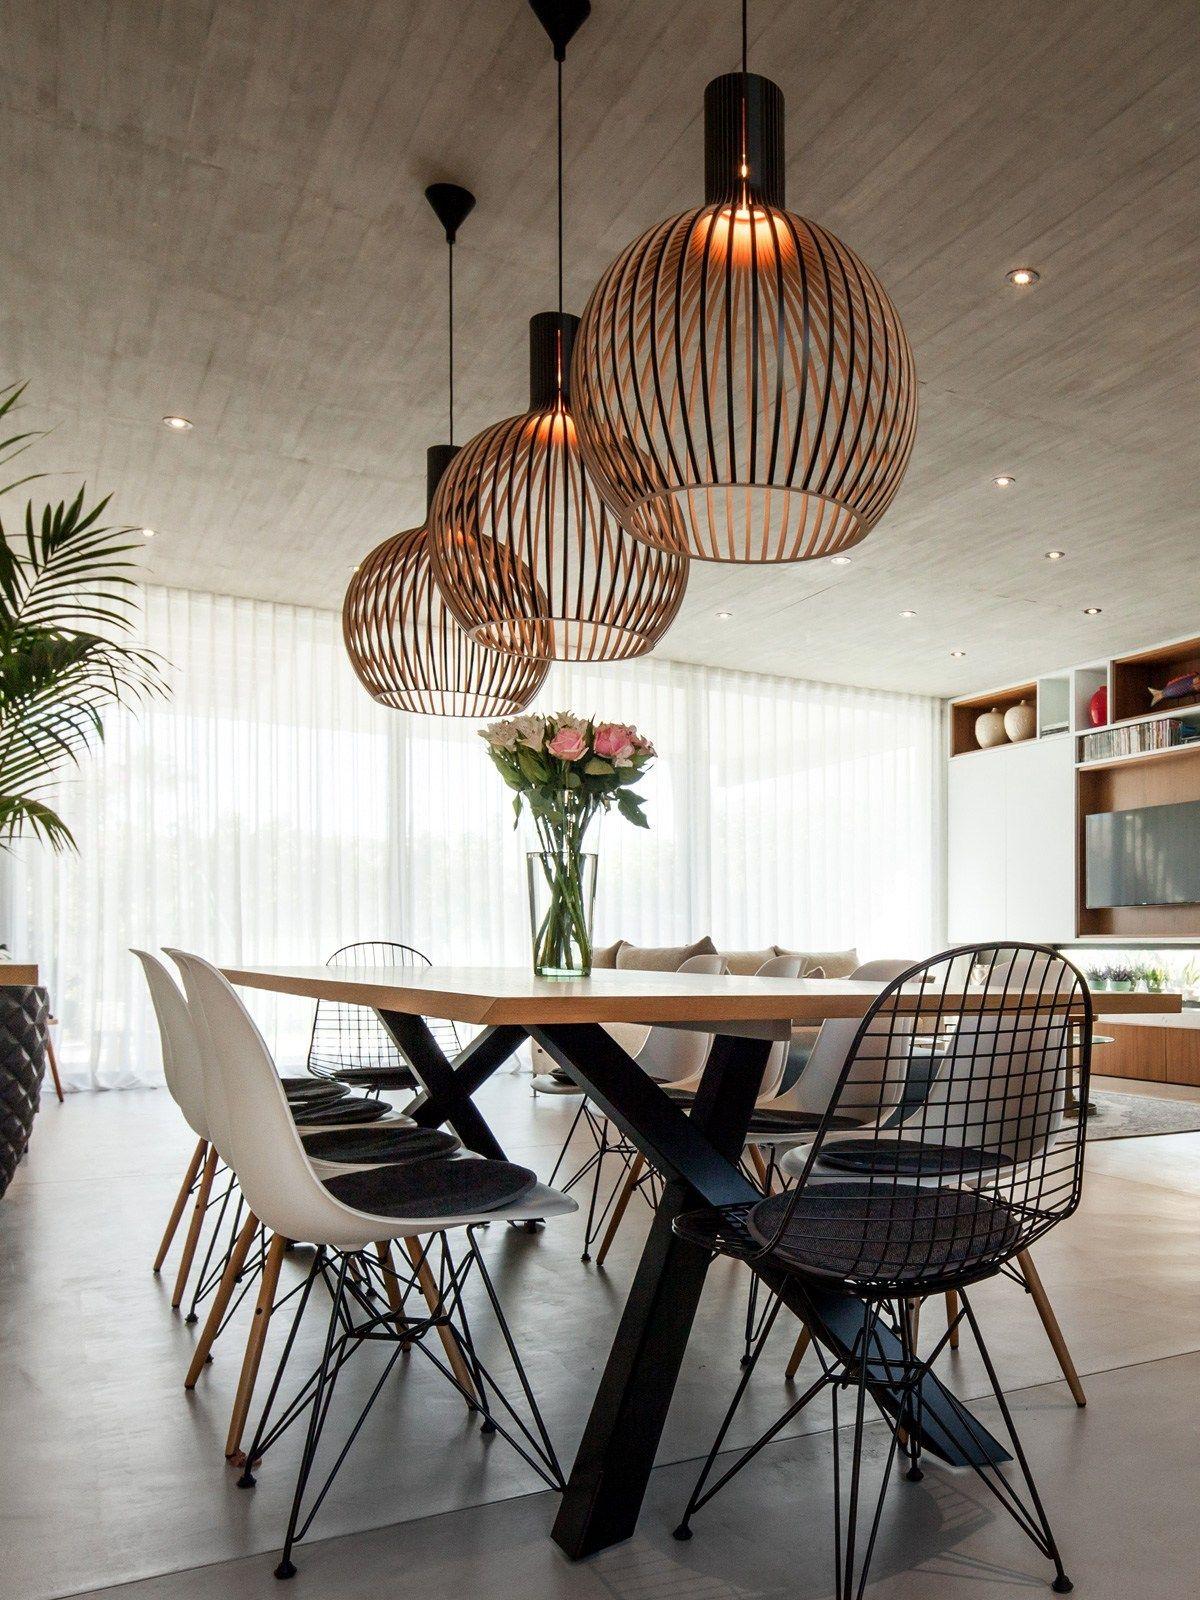 OCTO 9 Secto Design   DesignOrt.com   Esszimmer lampe modern ...